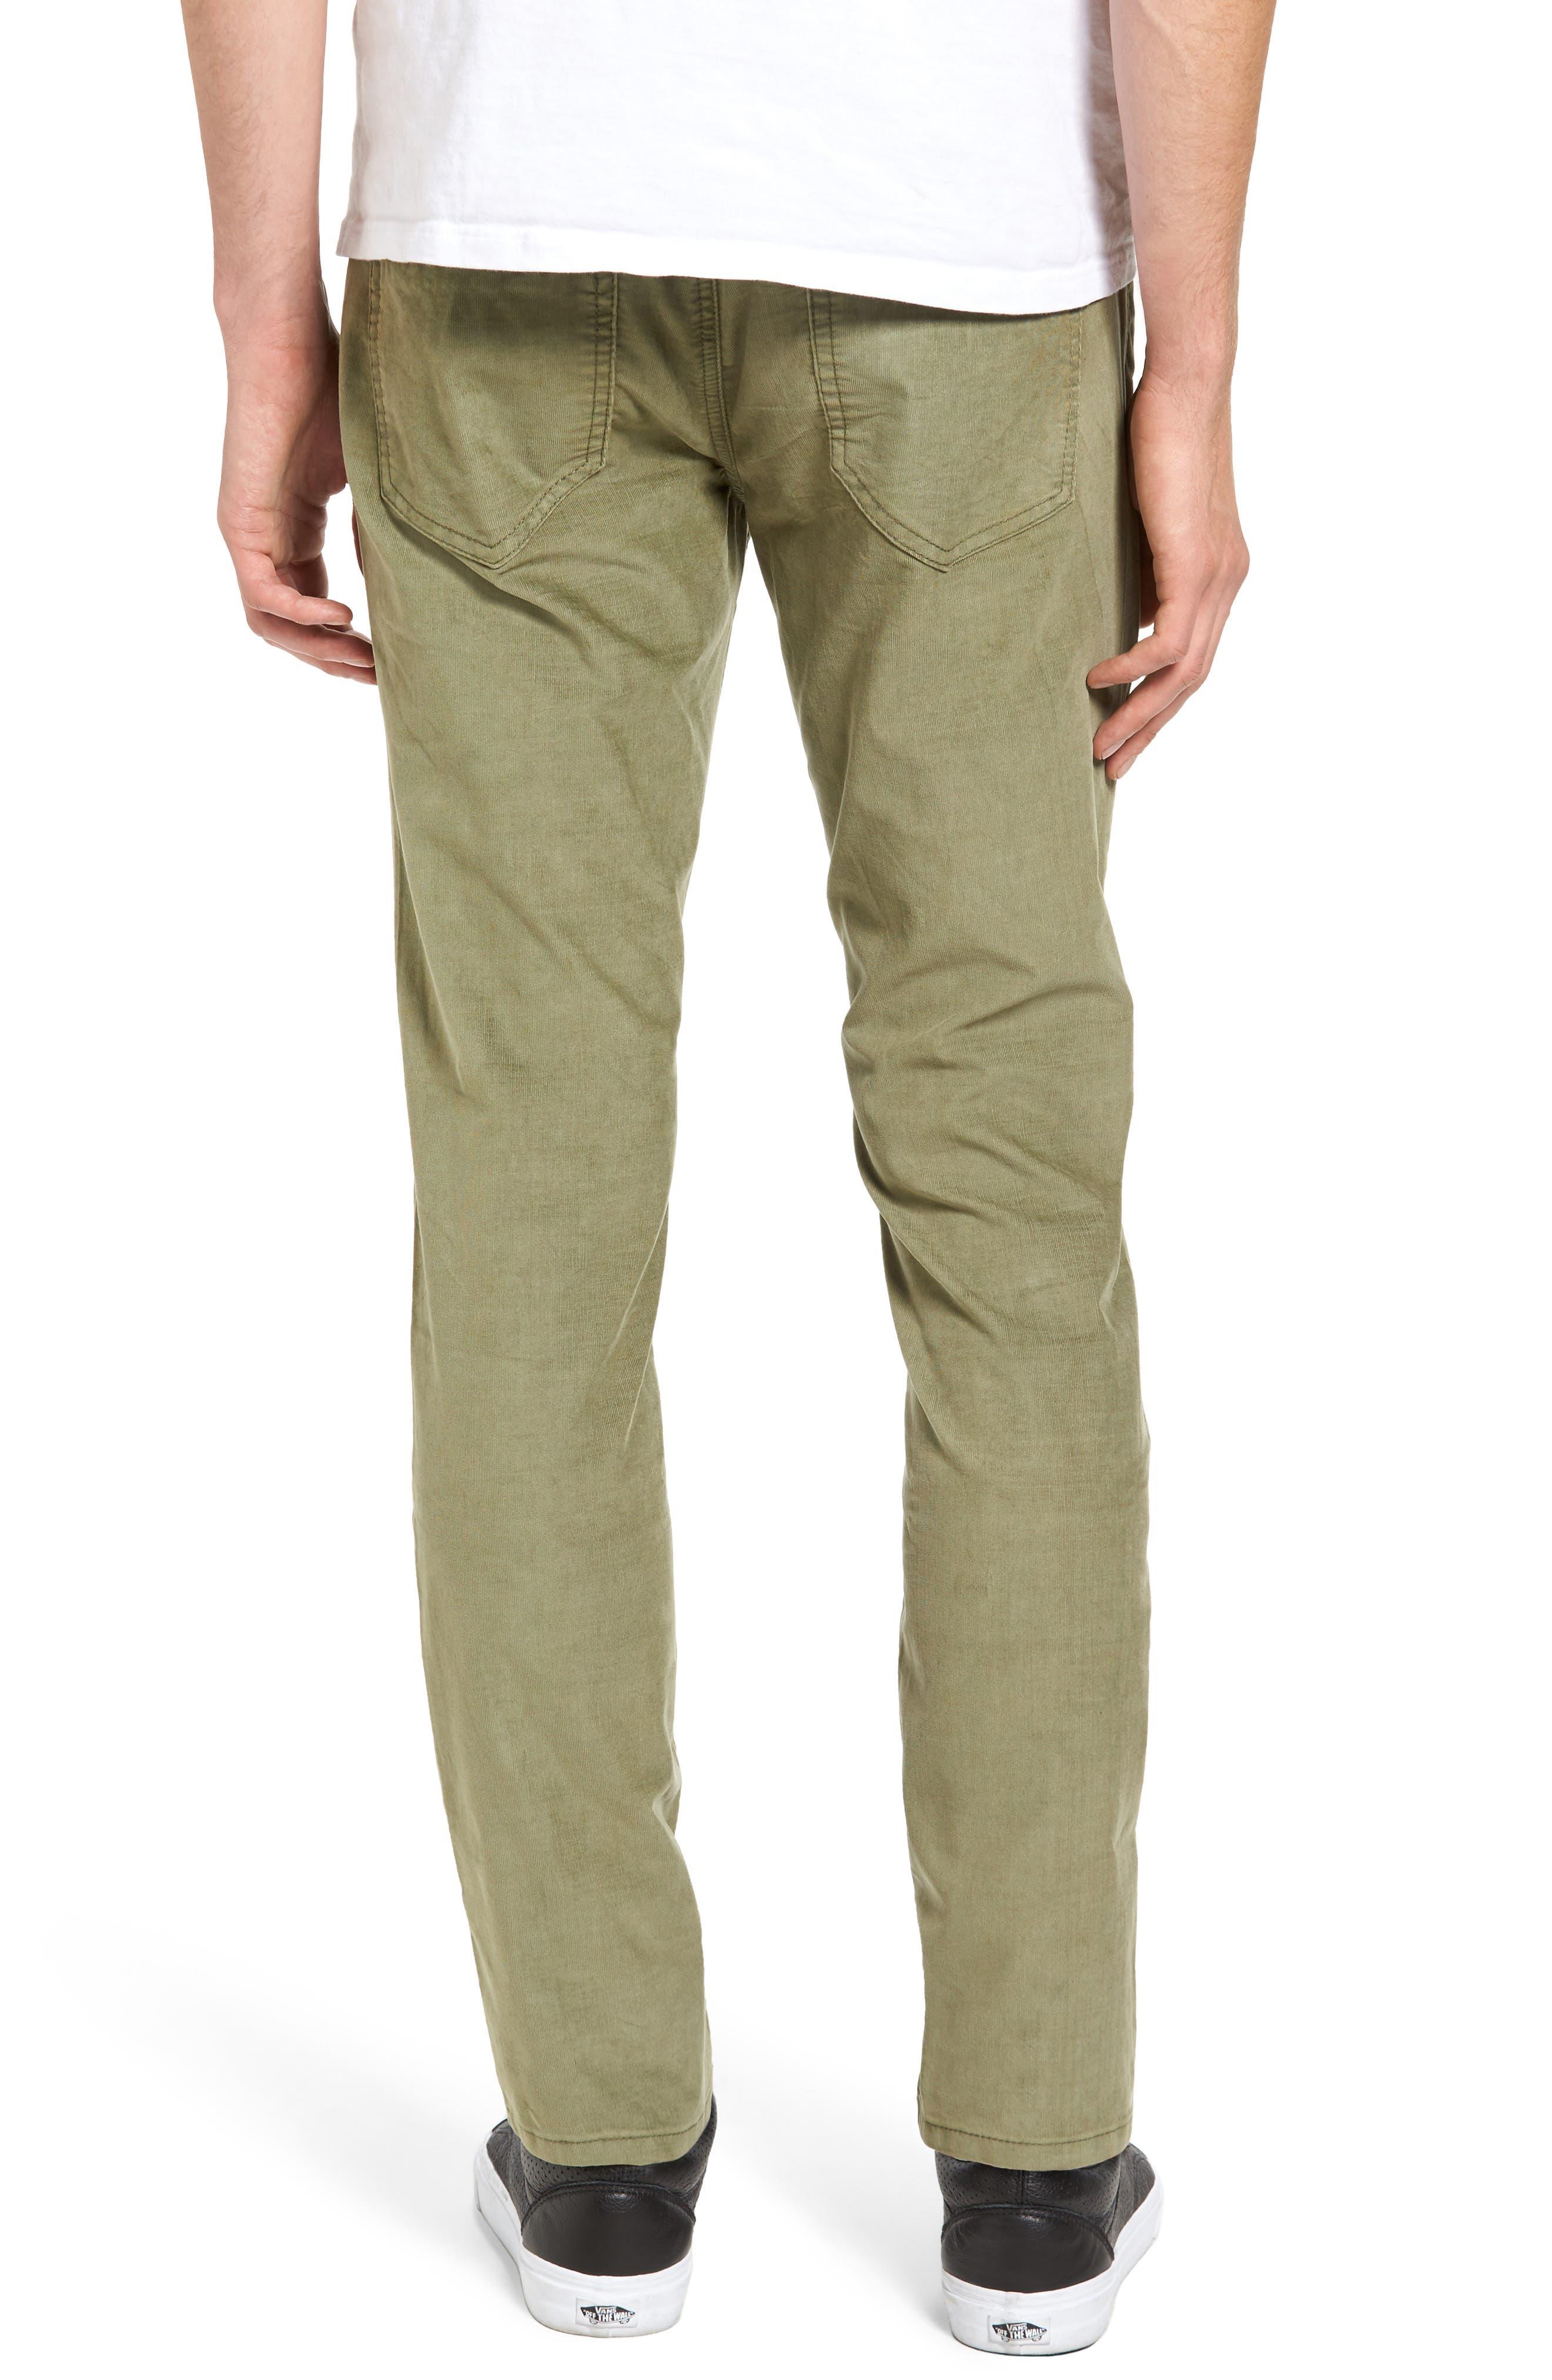 Bryce Chopper Slim Fit Corduroy Pants,                             Alternate thumbnail 3, color,                             302